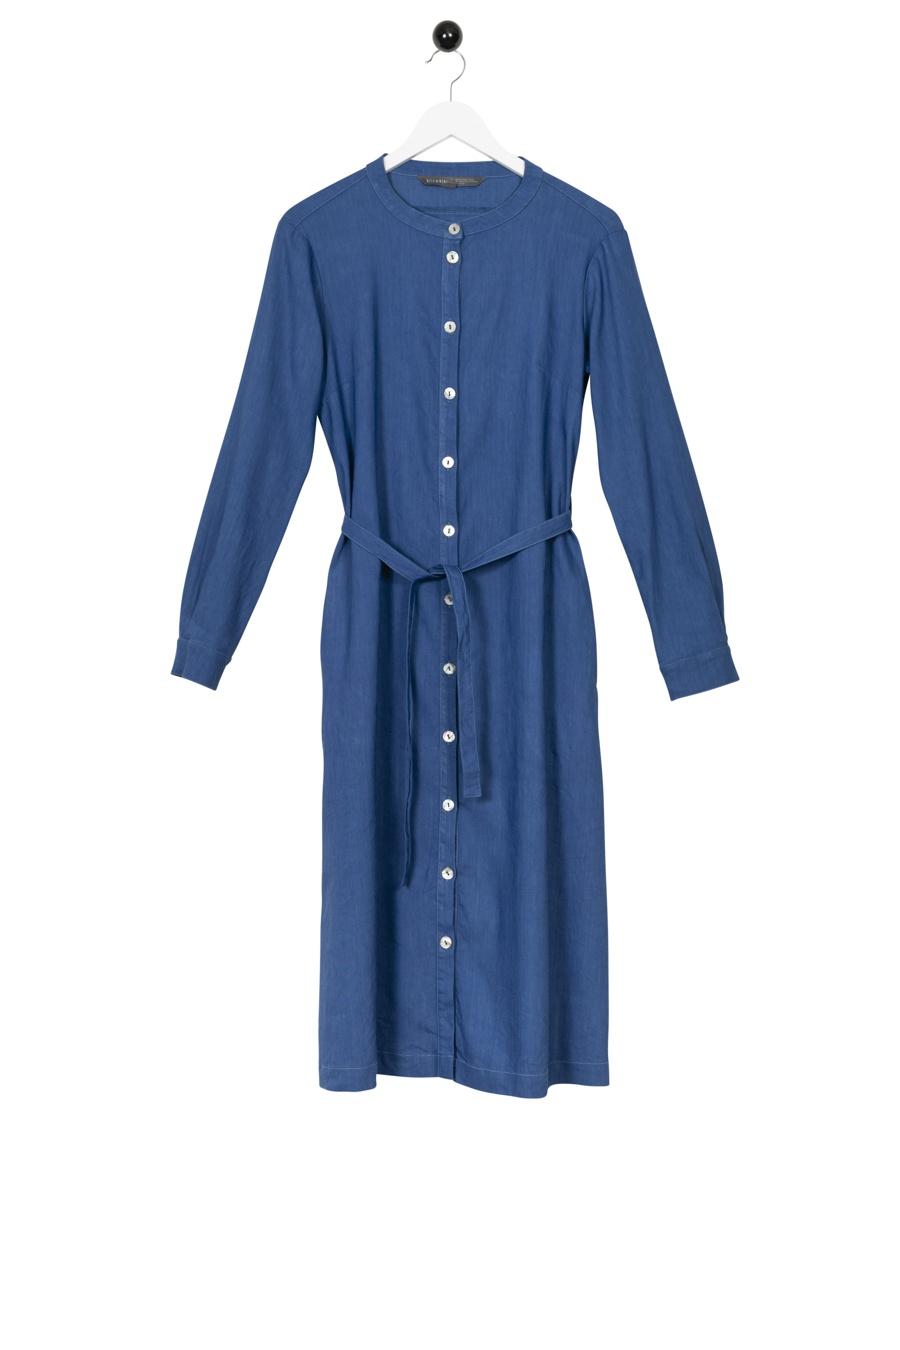 Nimes Dress